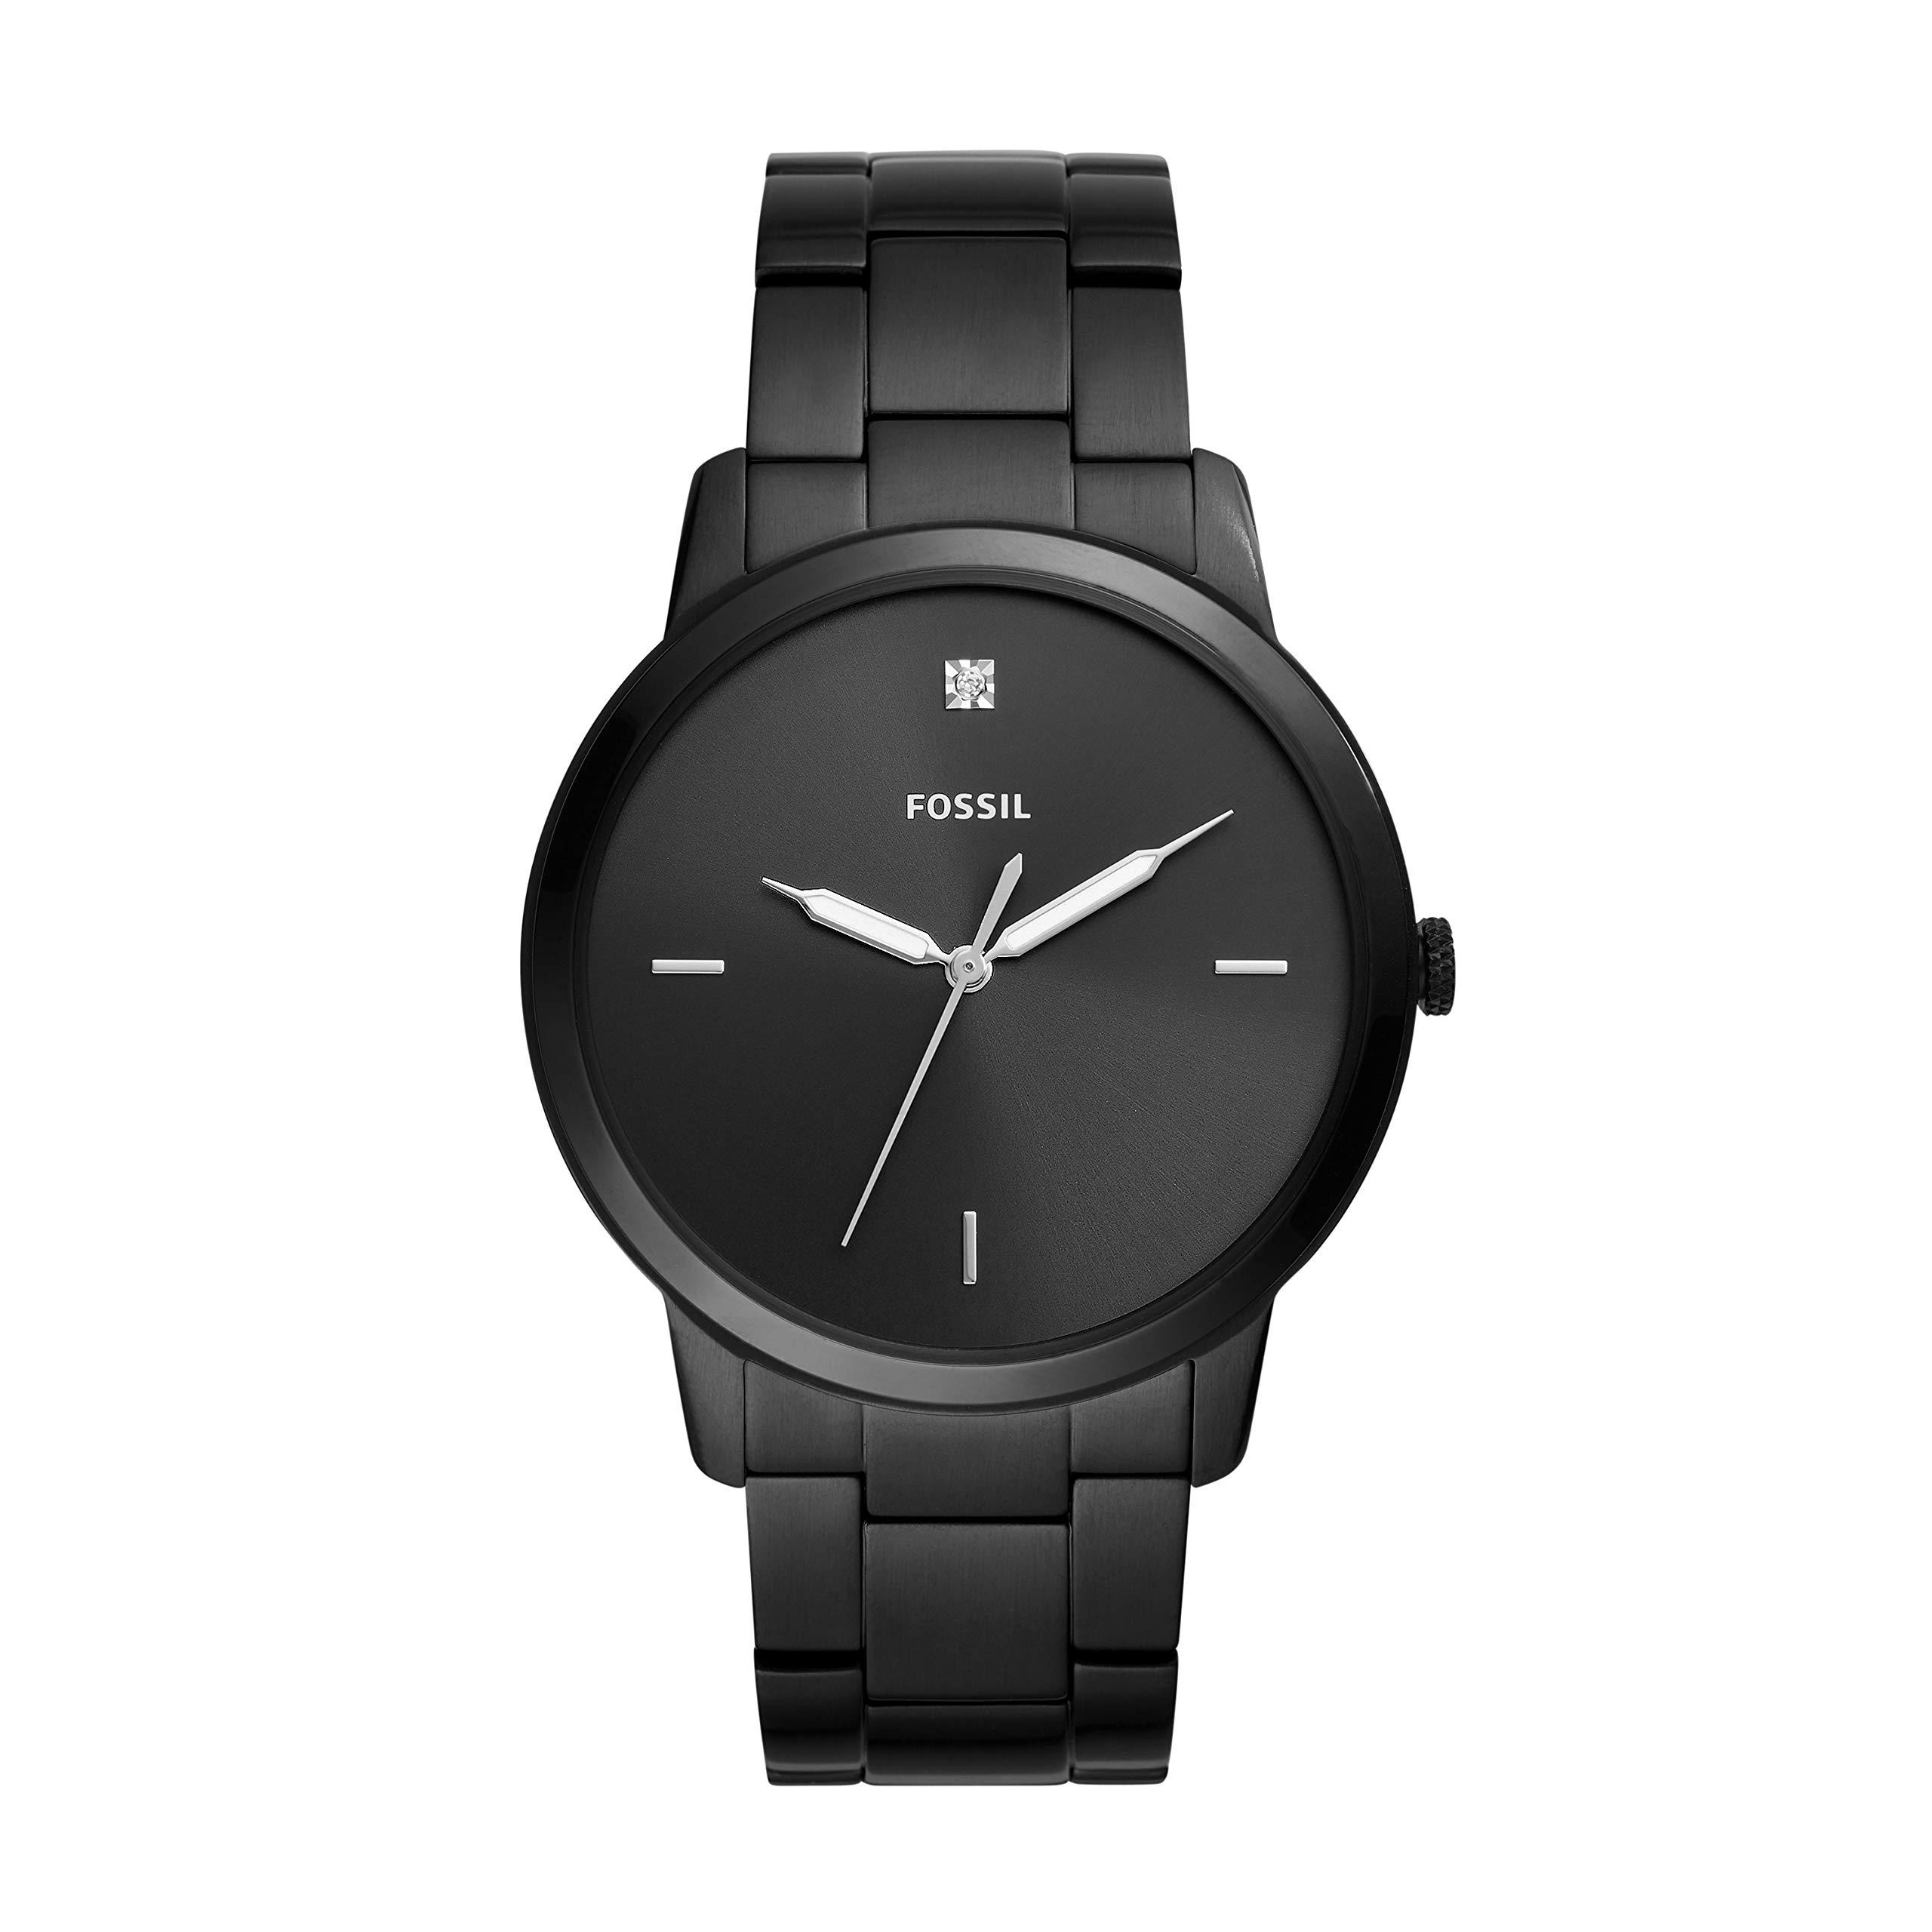 Fossil Men Minimalist Carbon Series Quartz Stainless Steel Diamond Accent Dress Watch, Color: Black (Model: FS5455) by Fossil